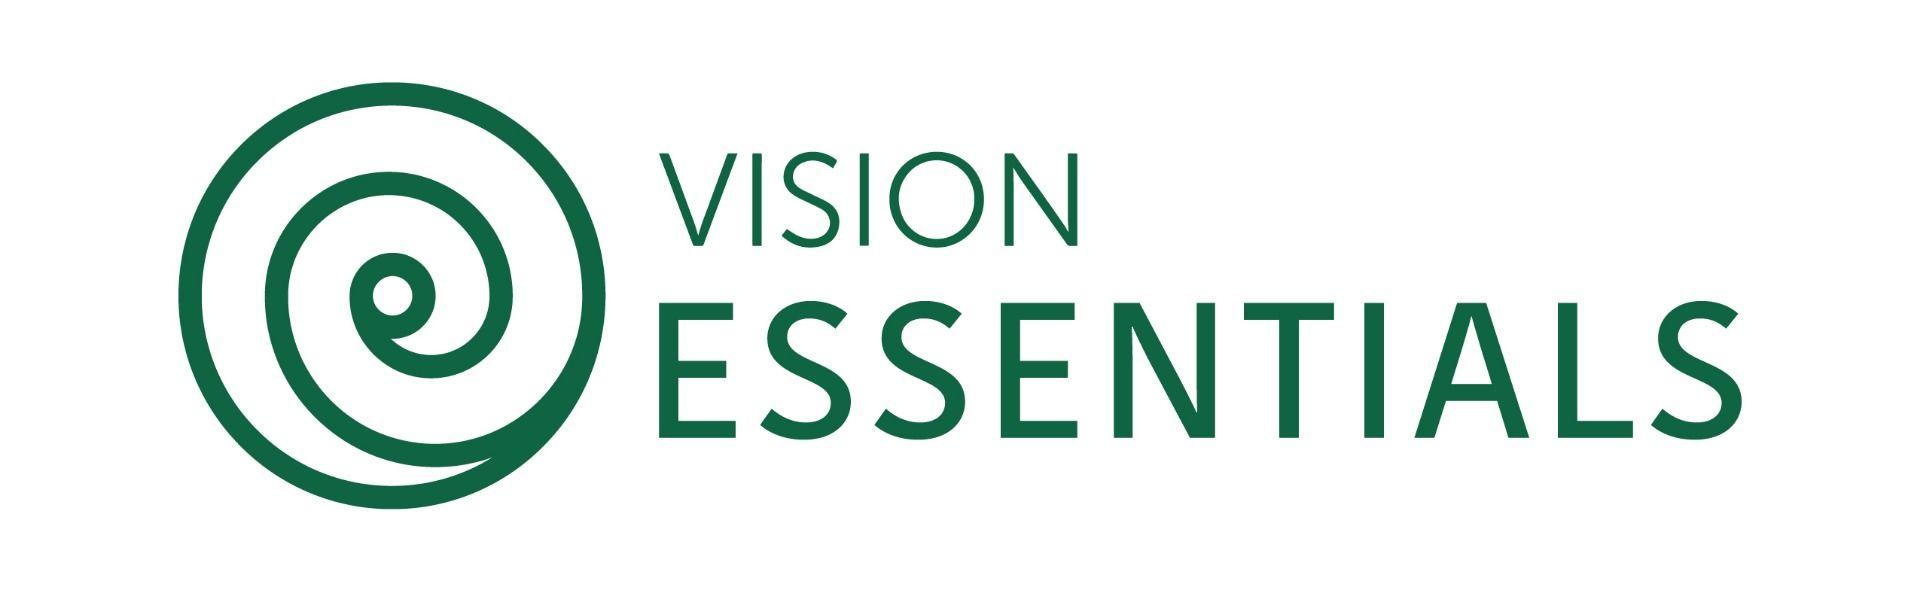 Vision Essentials brand logo